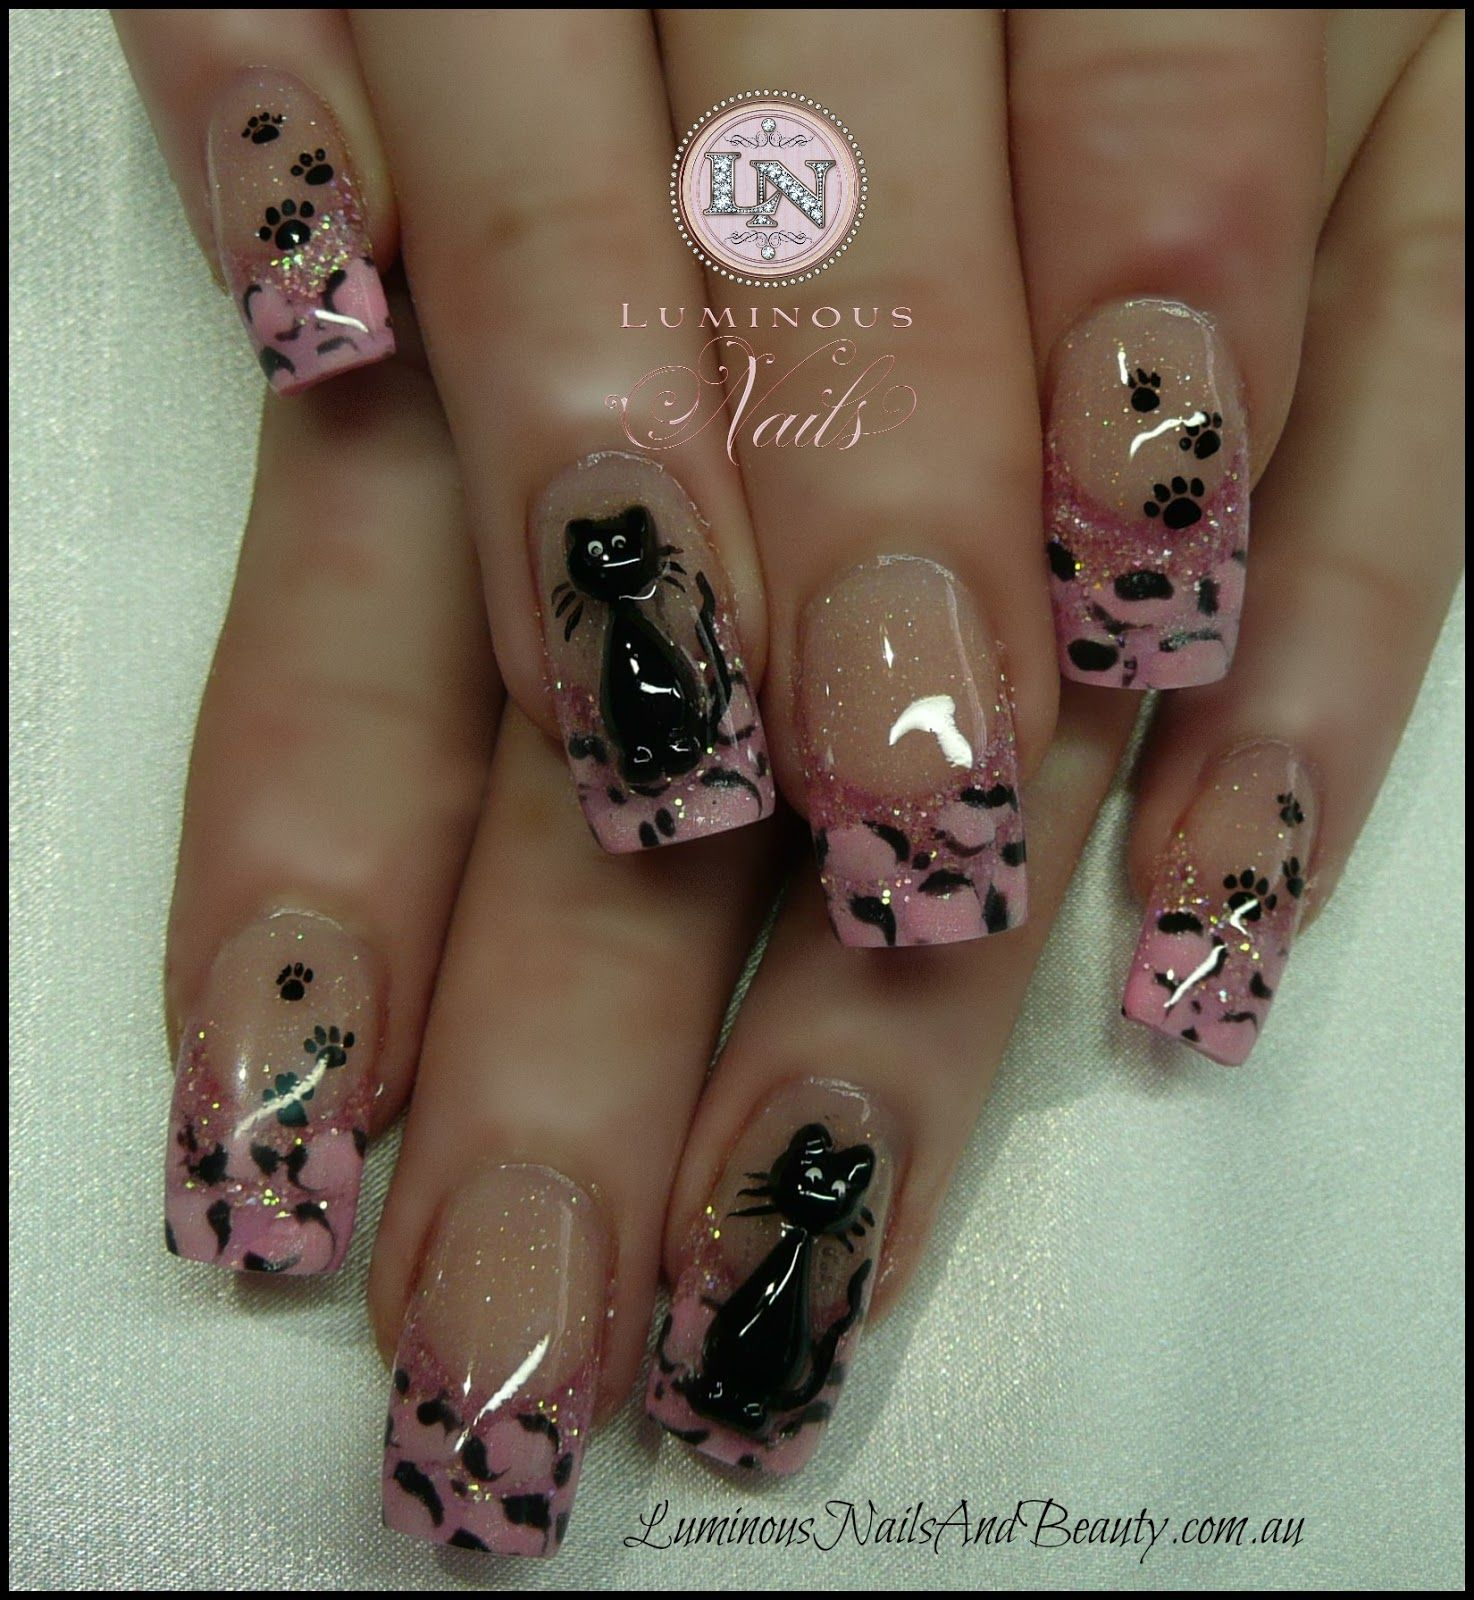 luminous nails a nailart fingern gel pinterest n gel fingern gel und geln gel. Black Bedroom Furniture Sets. Home Design Ideas